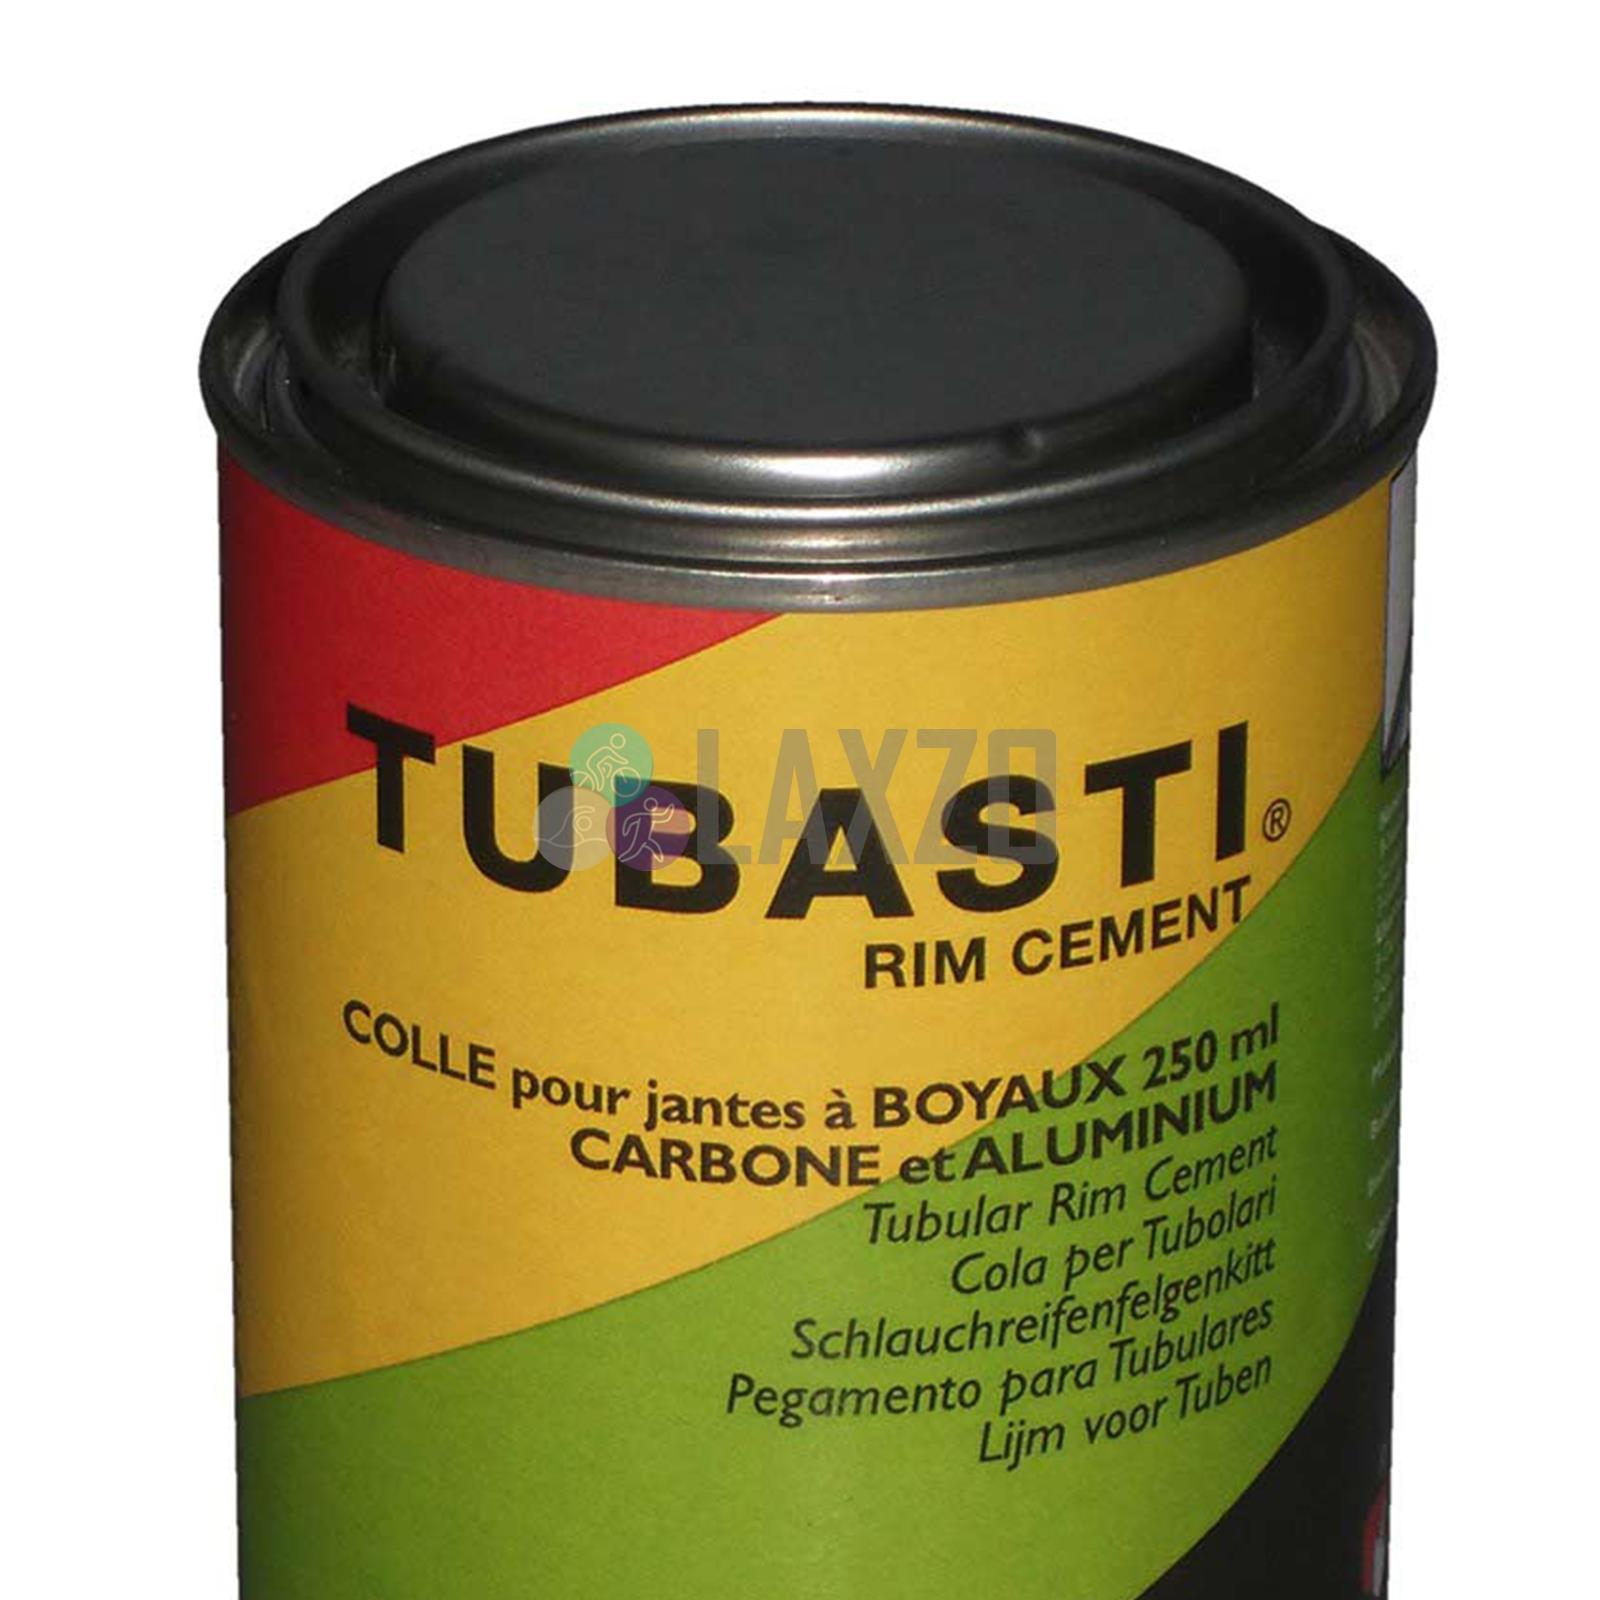 Velox Tubasti Tub Glue 178g